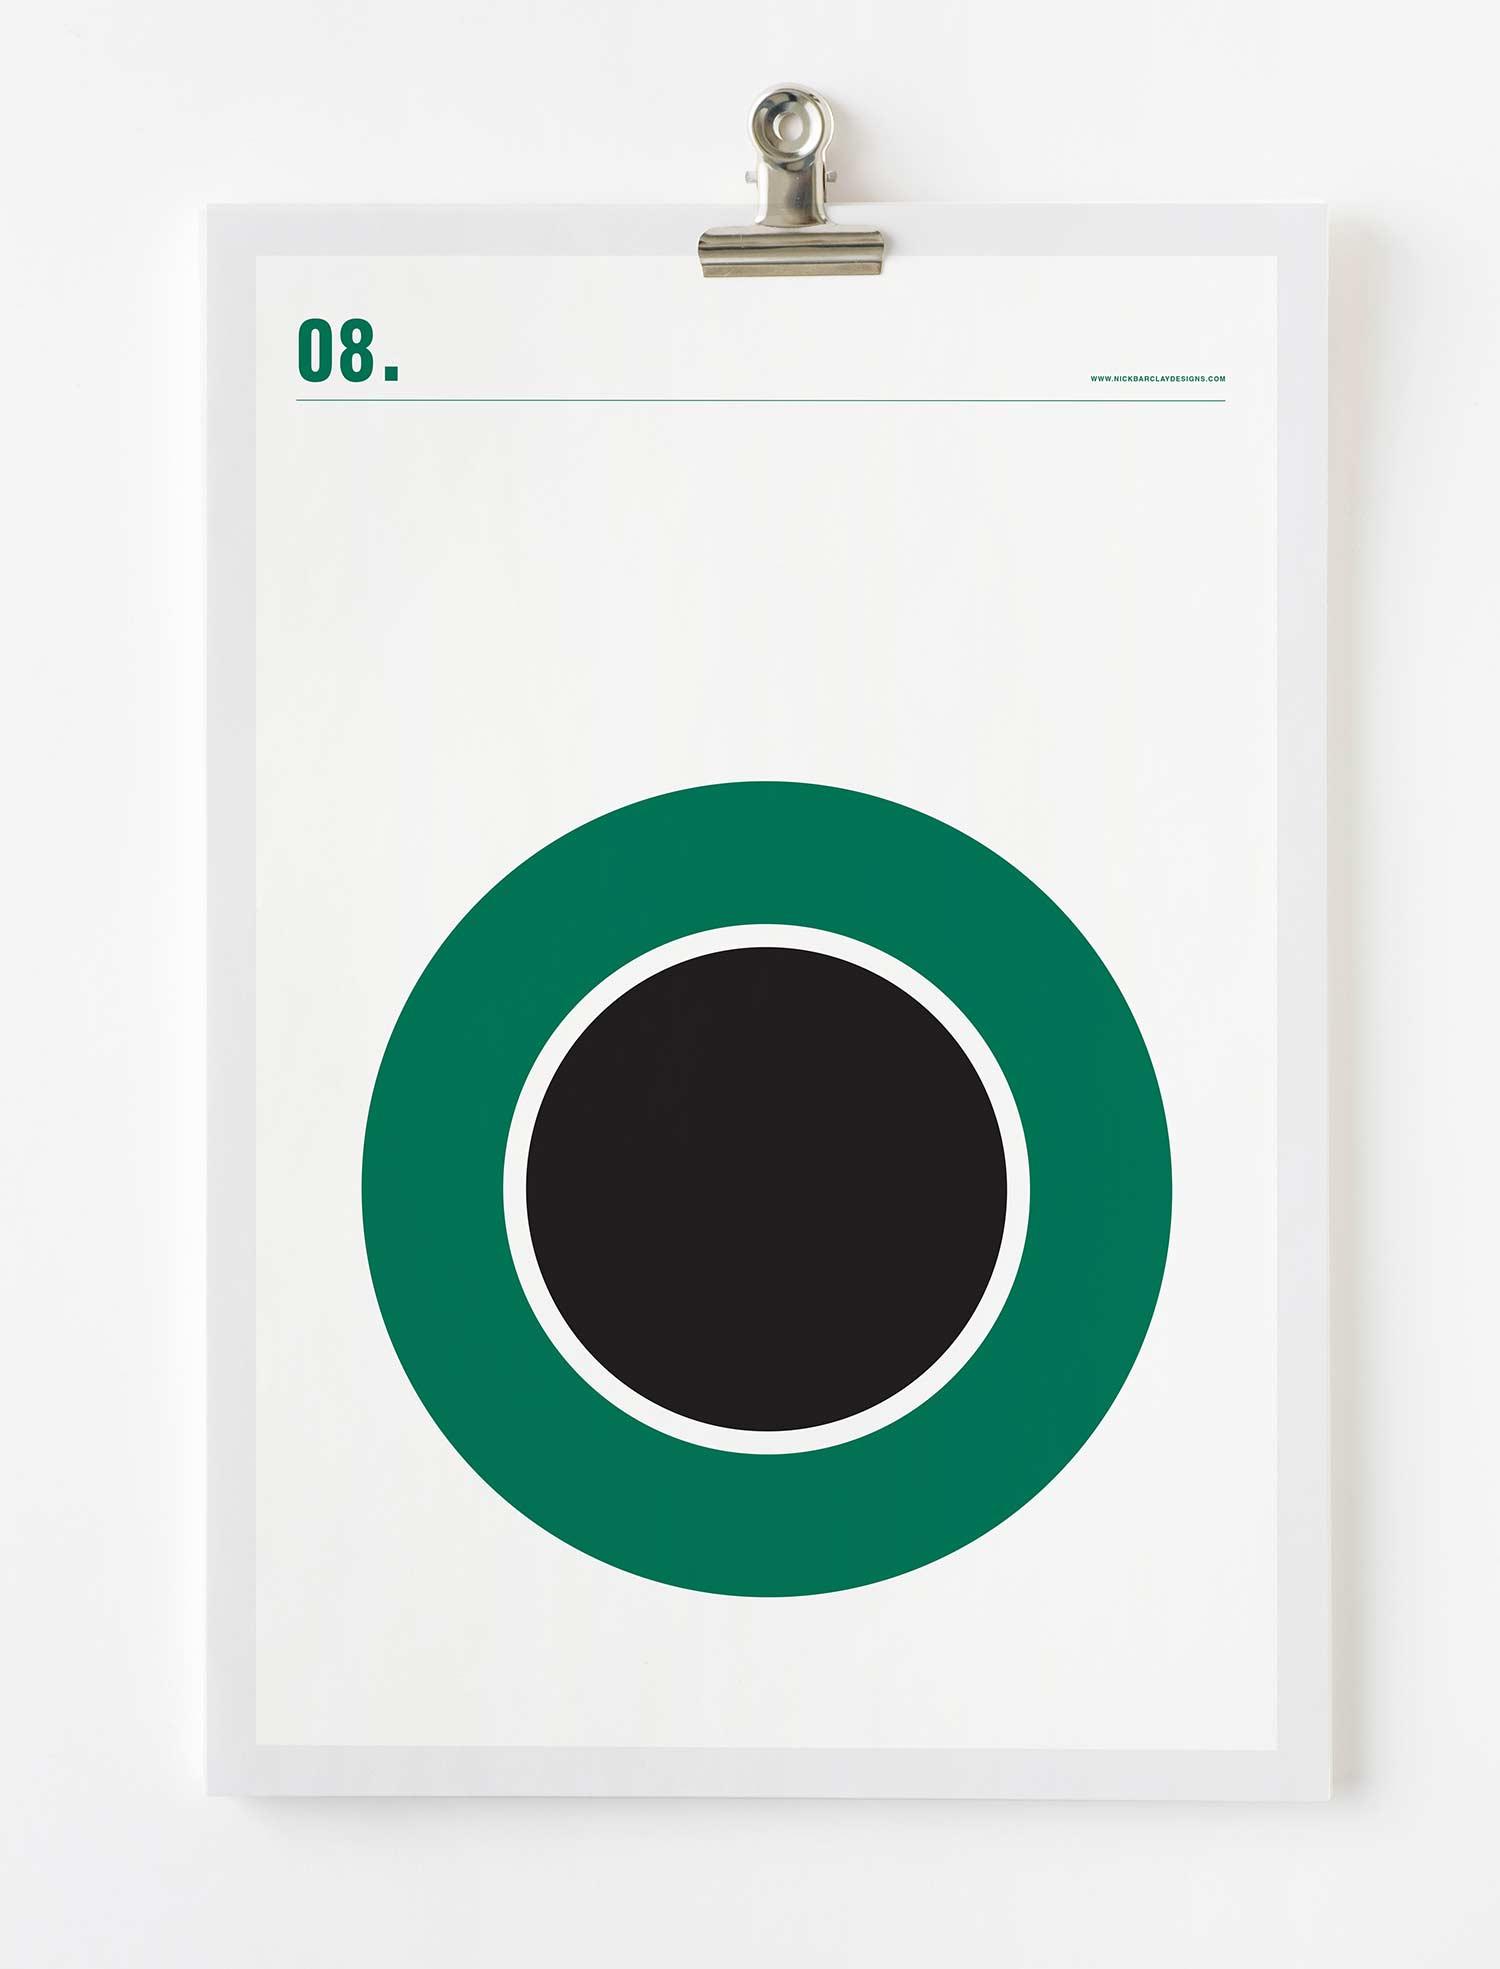 line-logos_Nick-Barclay_08 Line Logos